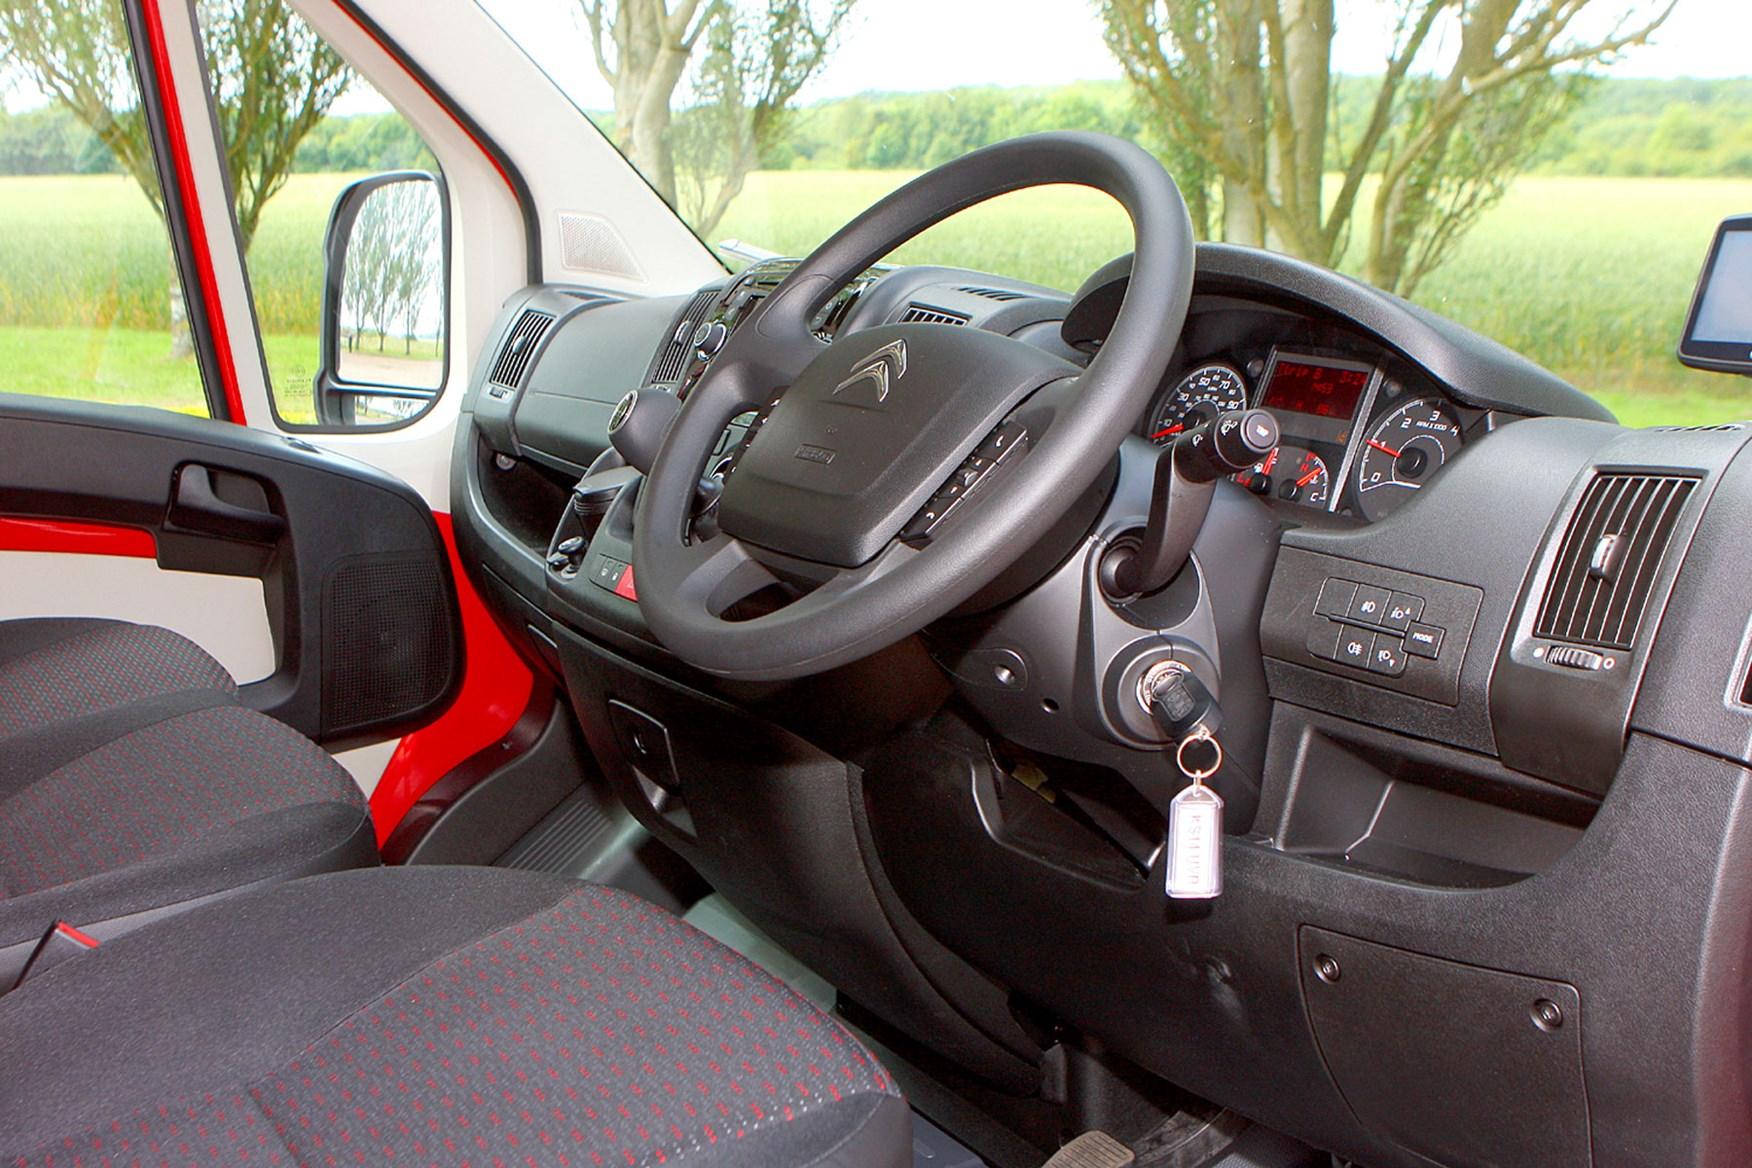 Citroen Relay 2.2 HDi 130 review - cab interior